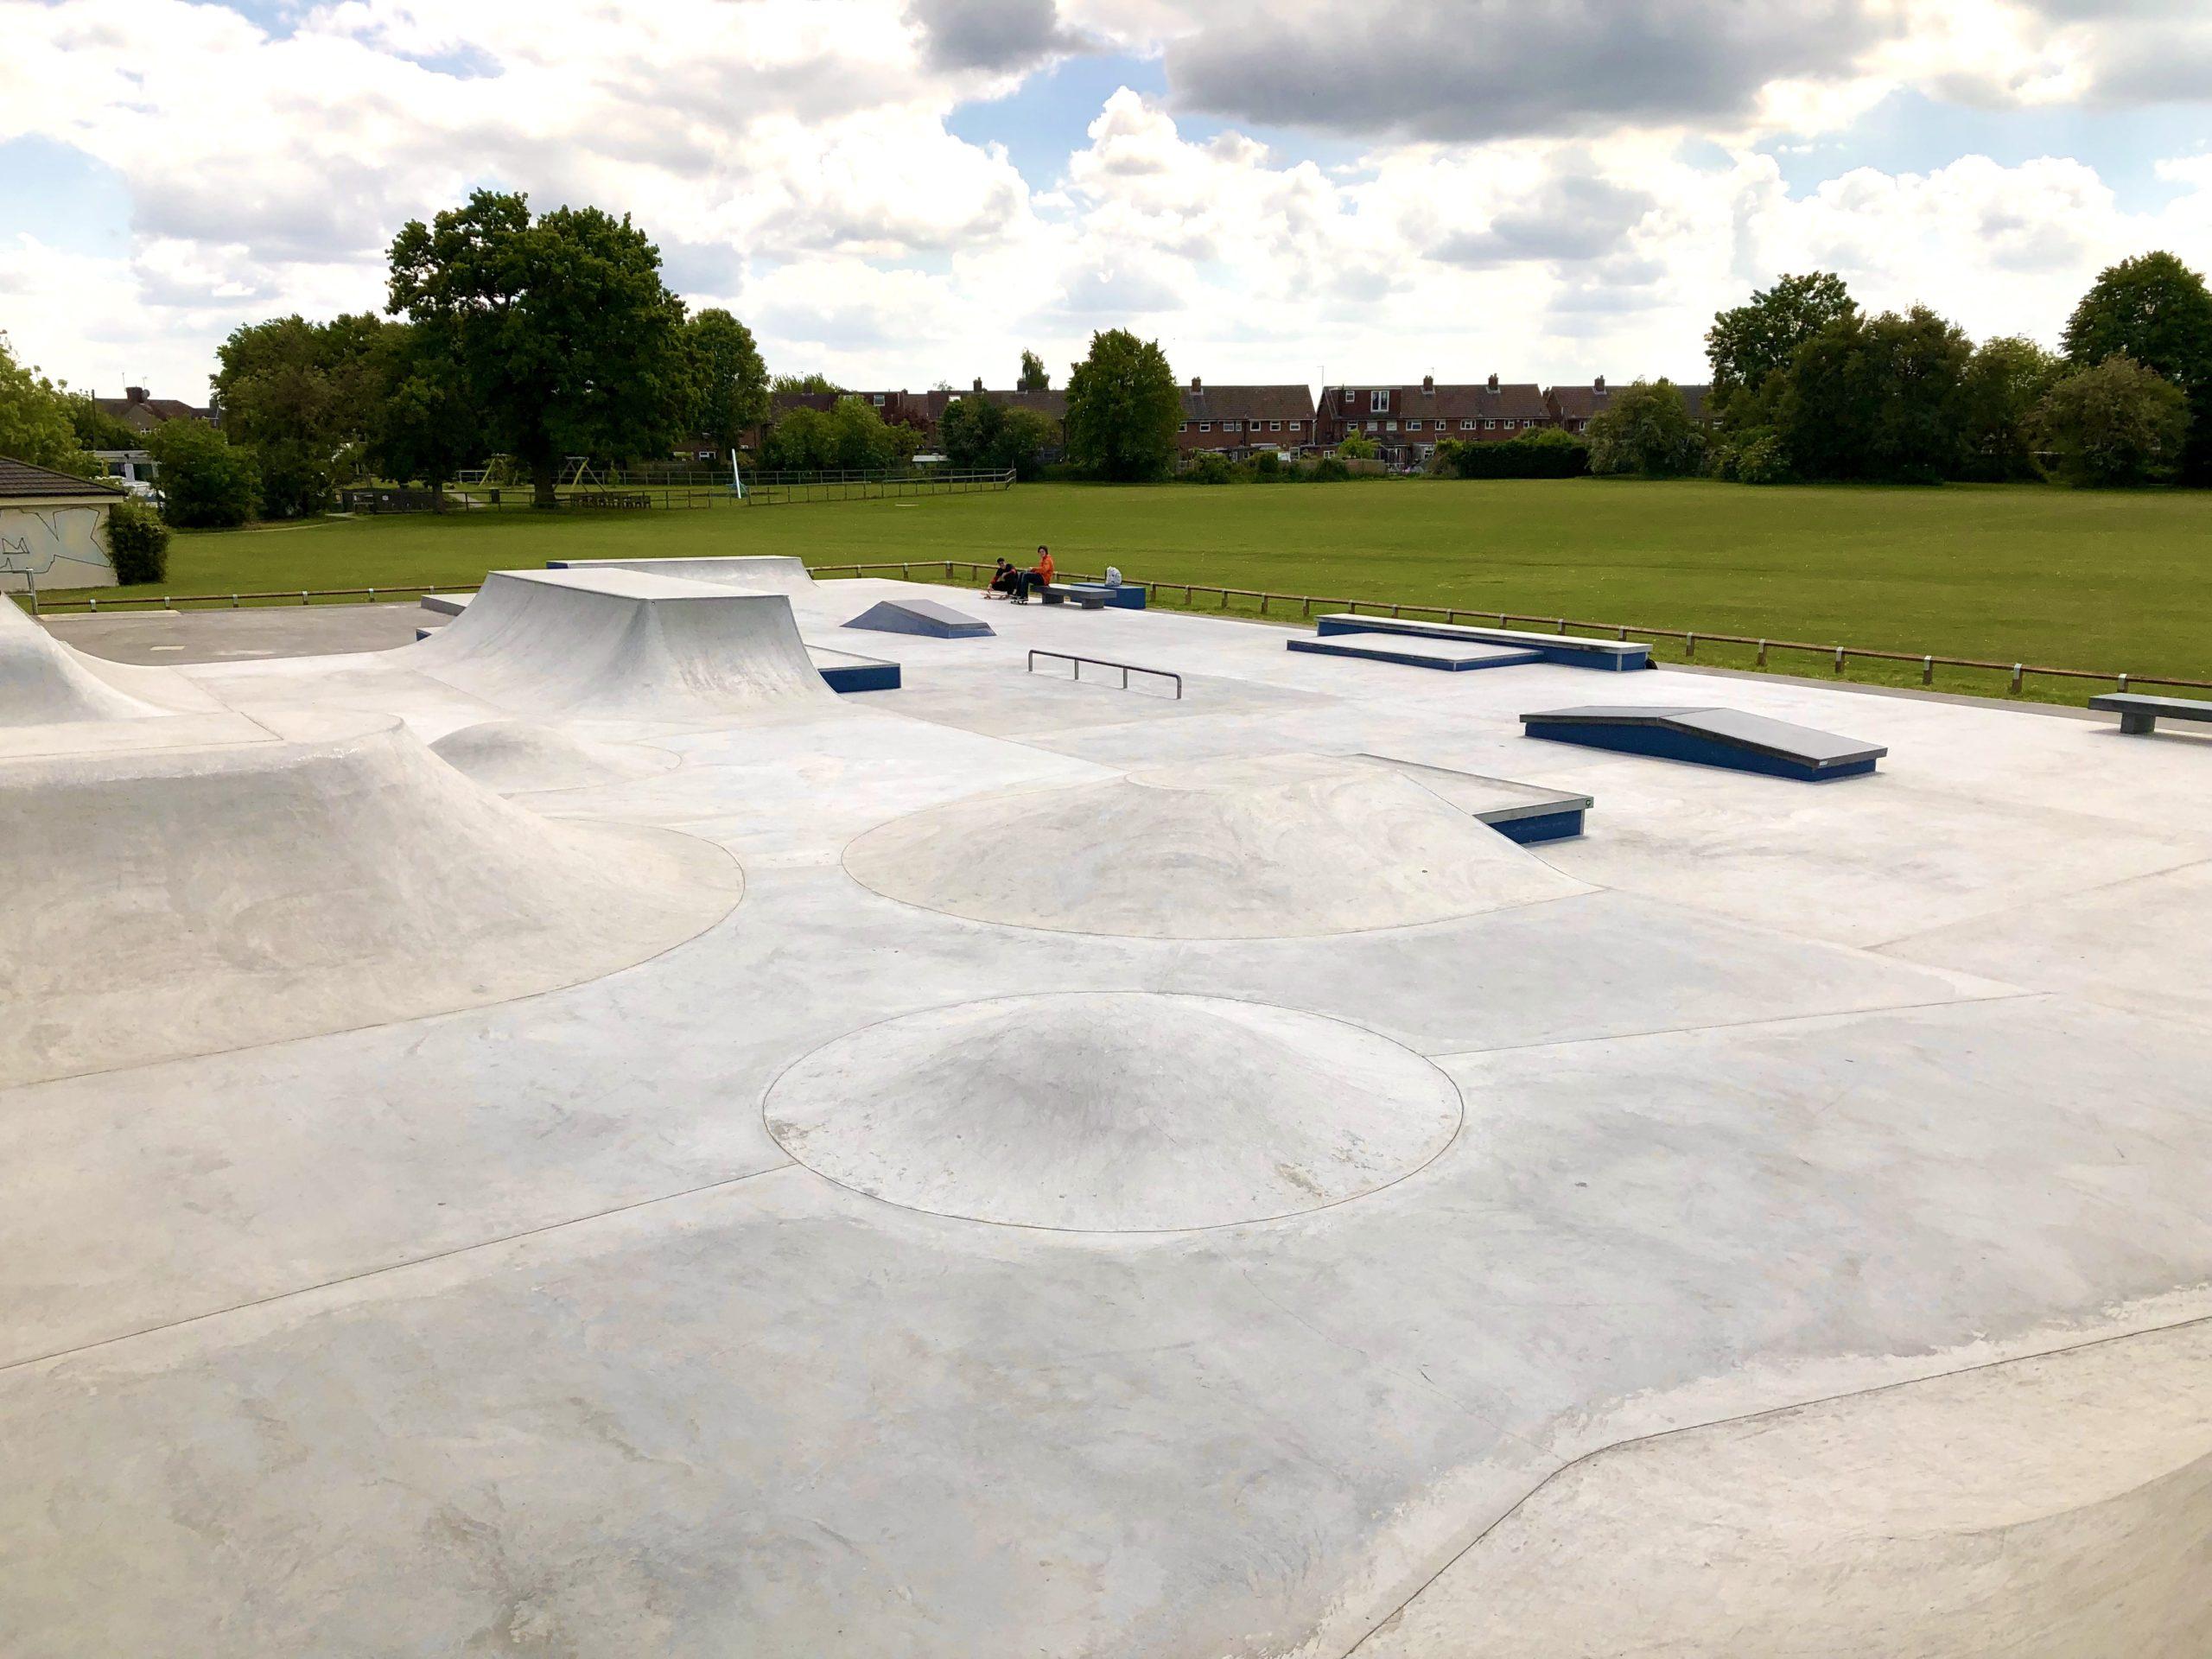 Trick Tech Skateboard Coaching Croxley Green Skatepark